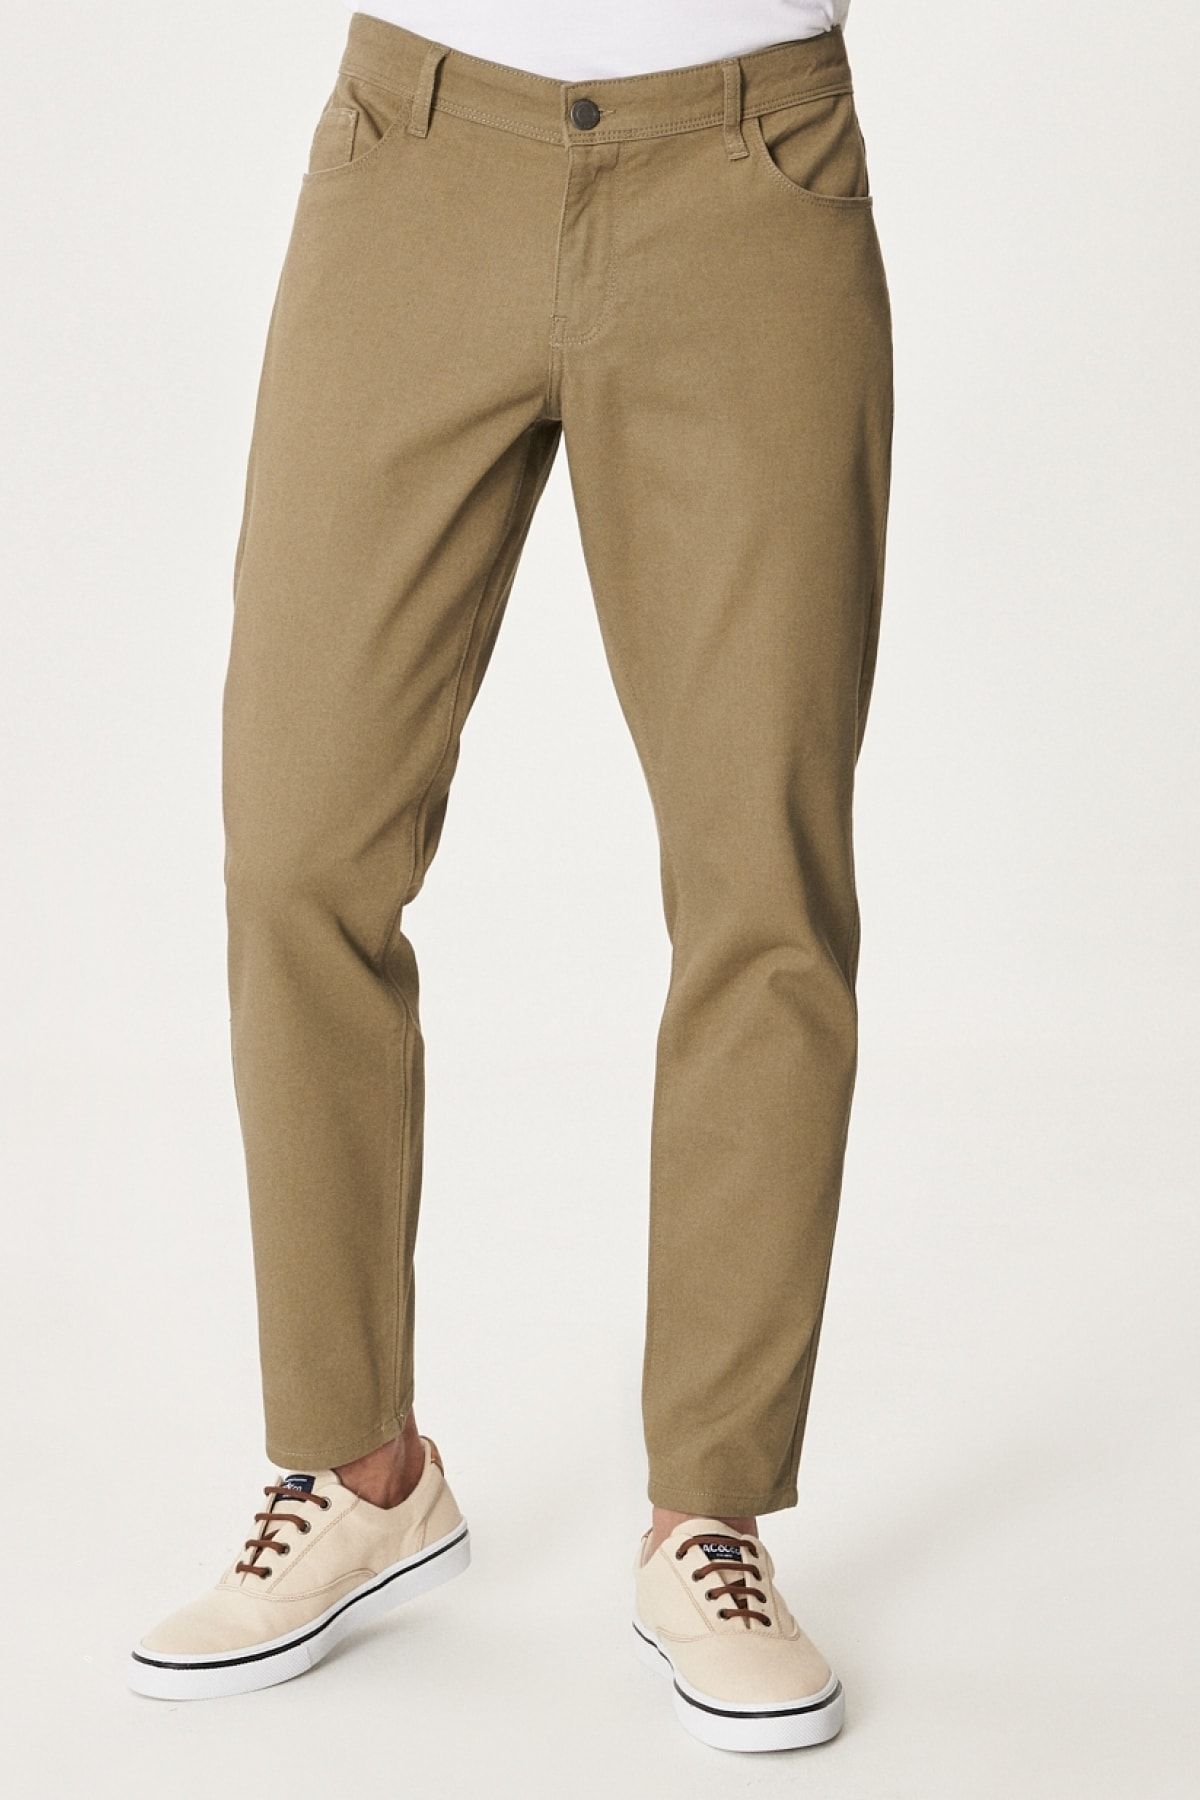 Erkek Yeşil Kanvas Slim Fit Dar Kesim 5 Cep Pantolon